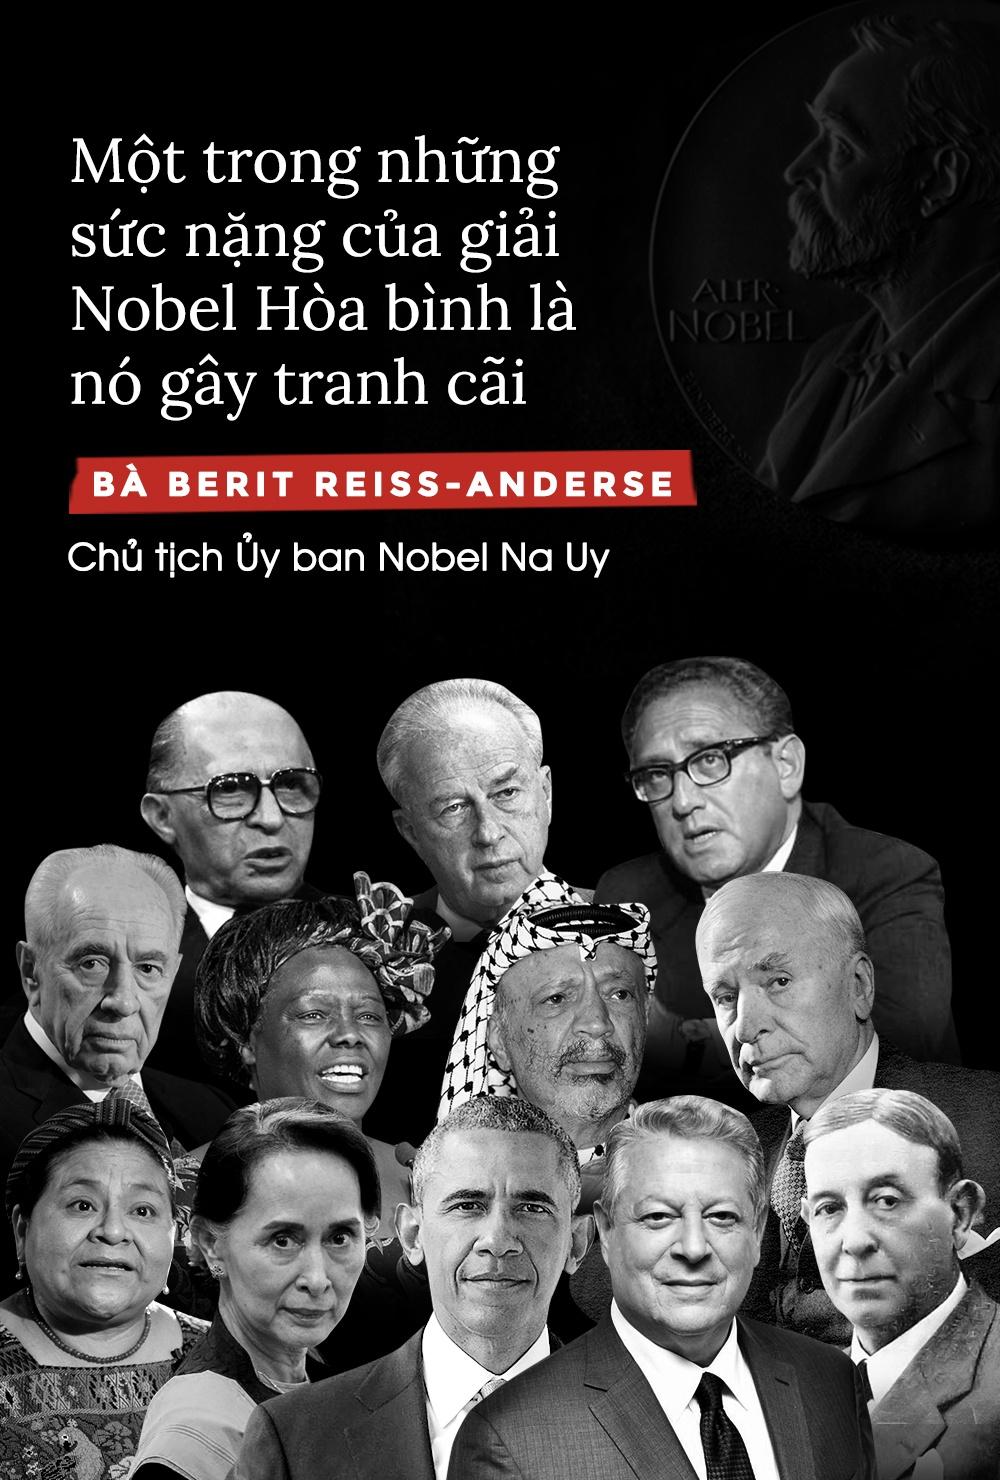 Mua Nobel tranh cai - Huy giai van hoc, TT Trump nhan Nobel Hoa binh? hinh anh 4